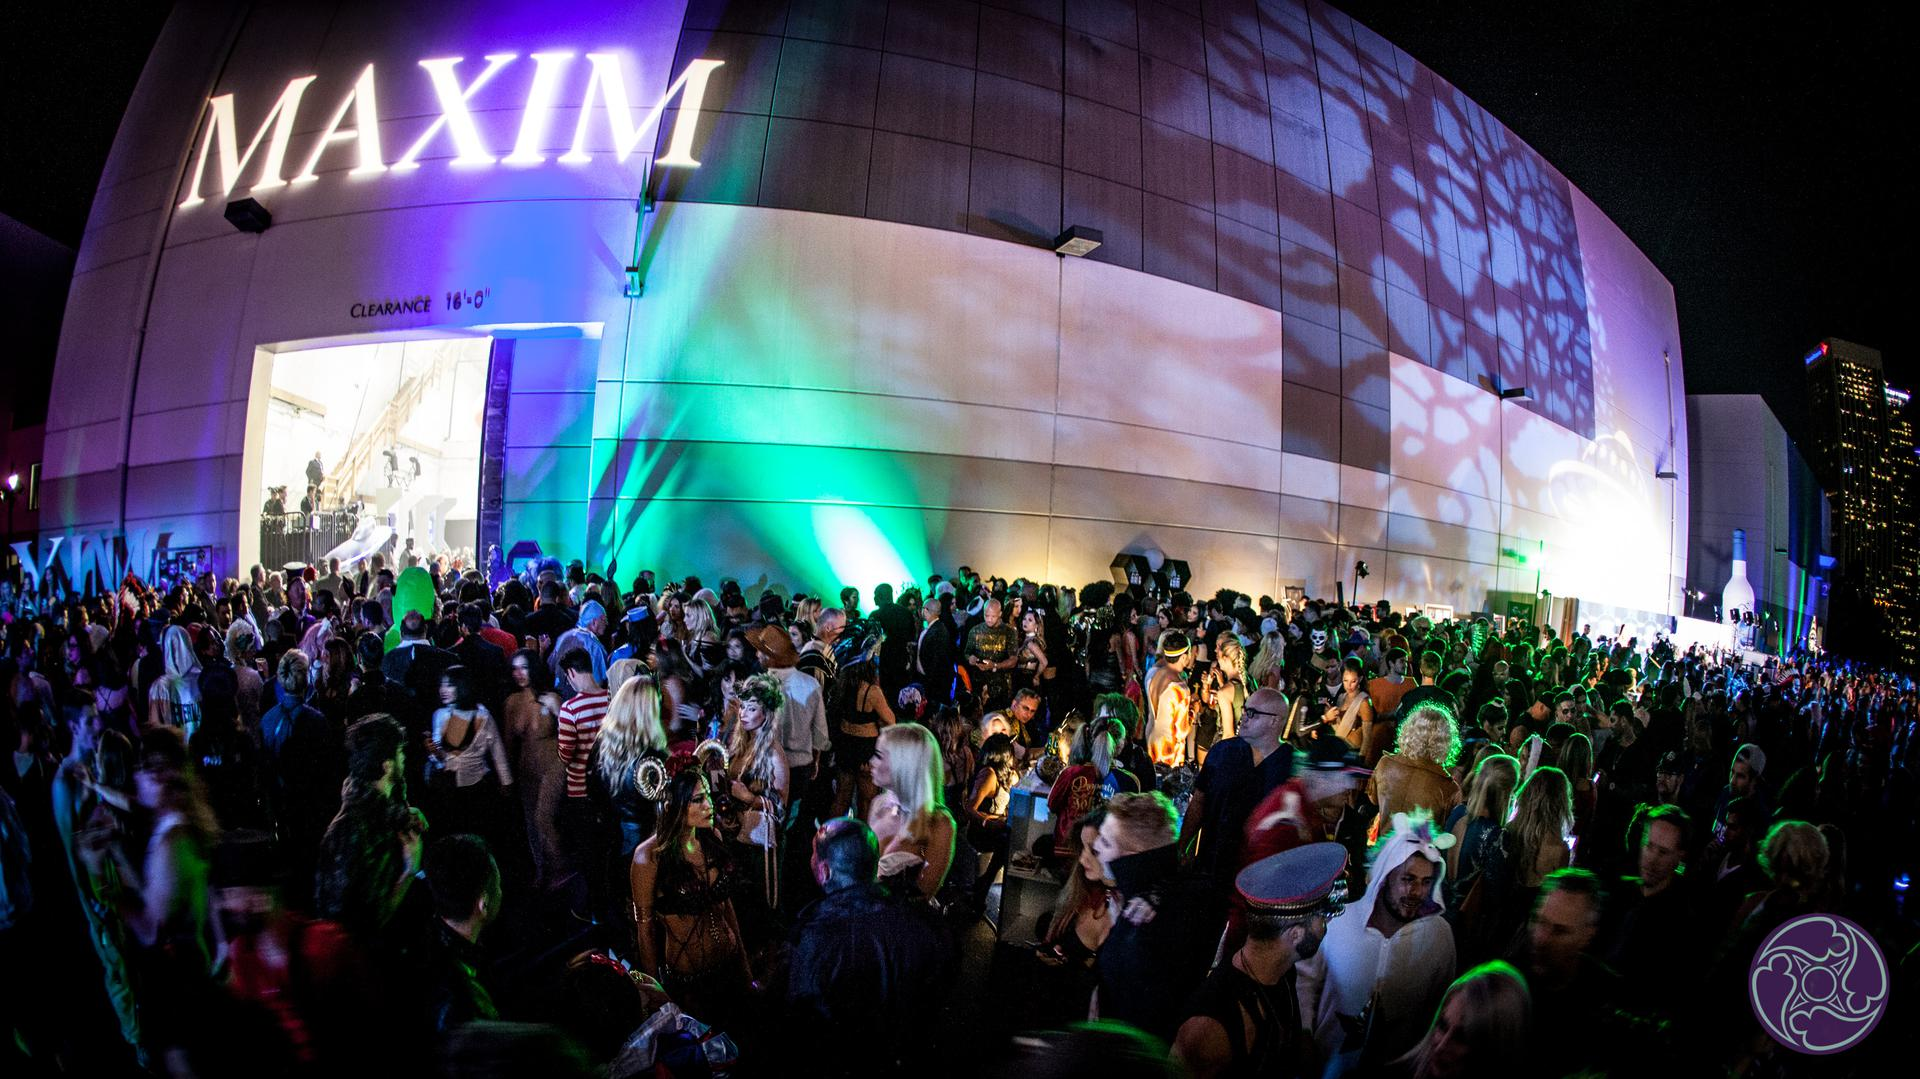 LA Center studios hosts the 2017 Maxim Halloween Party